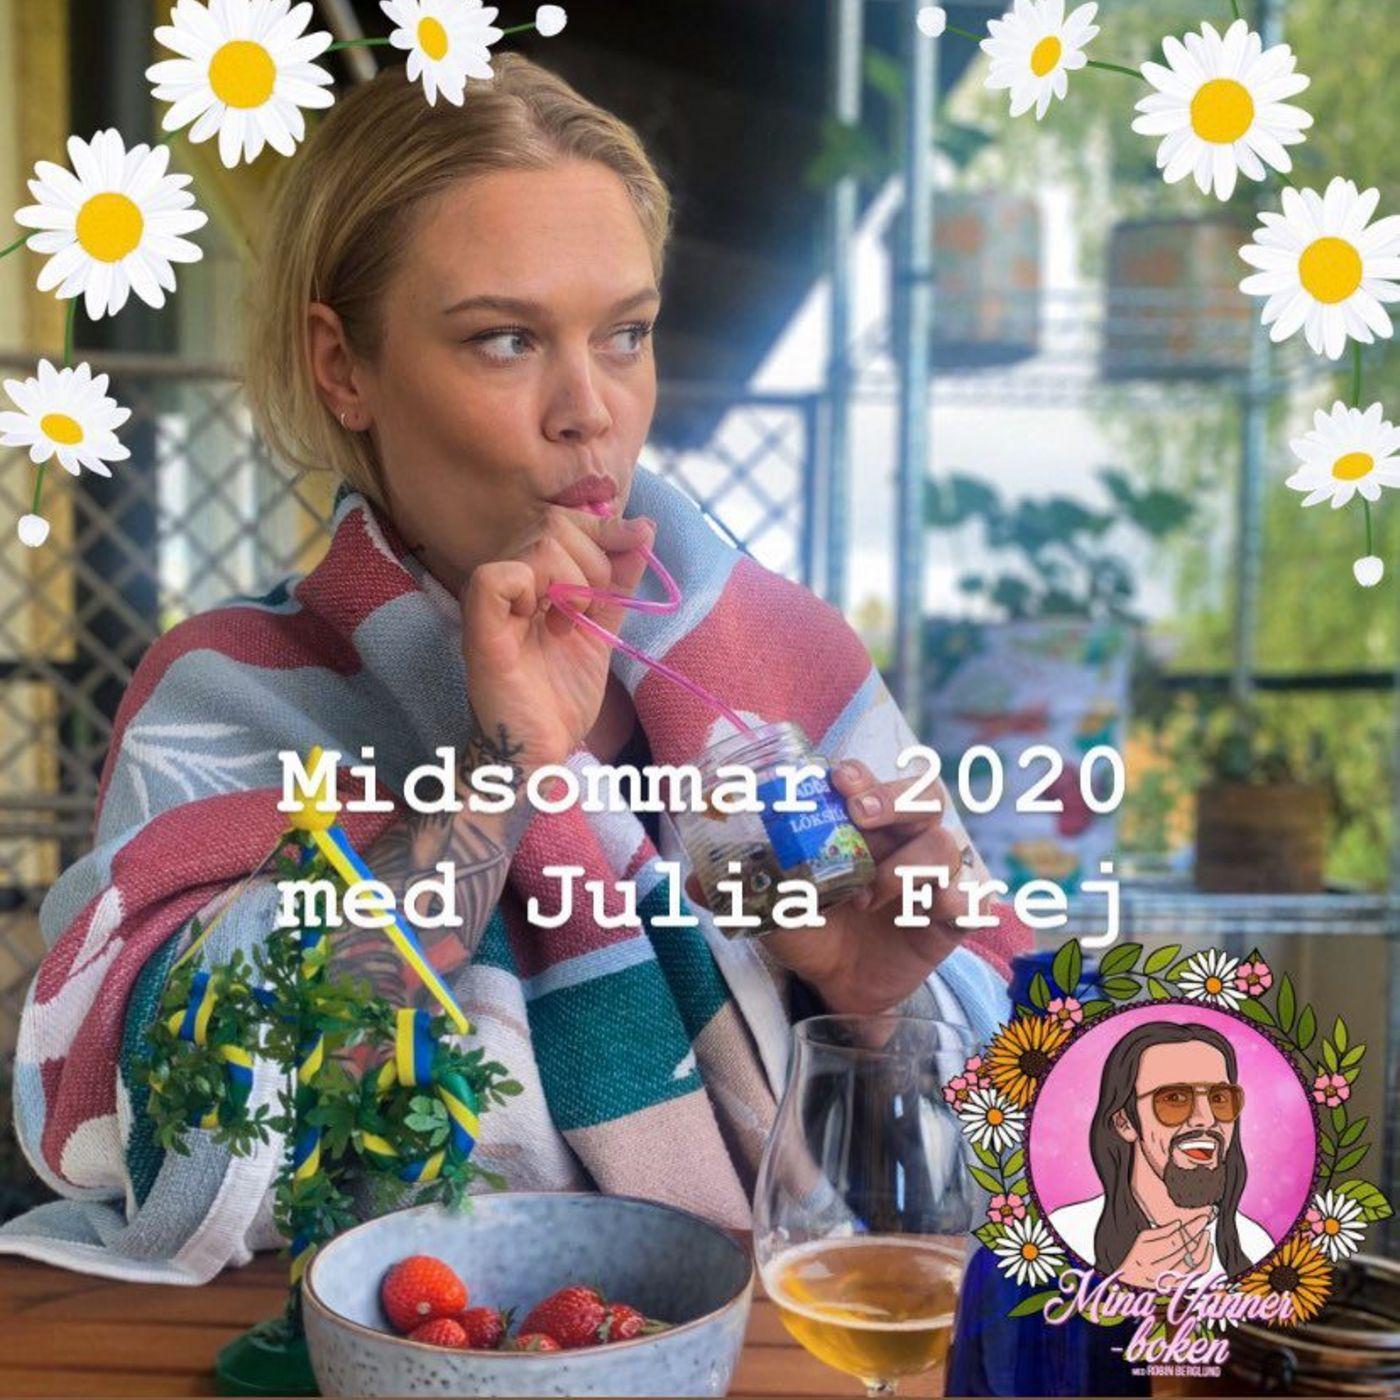 Midsommar 2020 Med Julia Frej